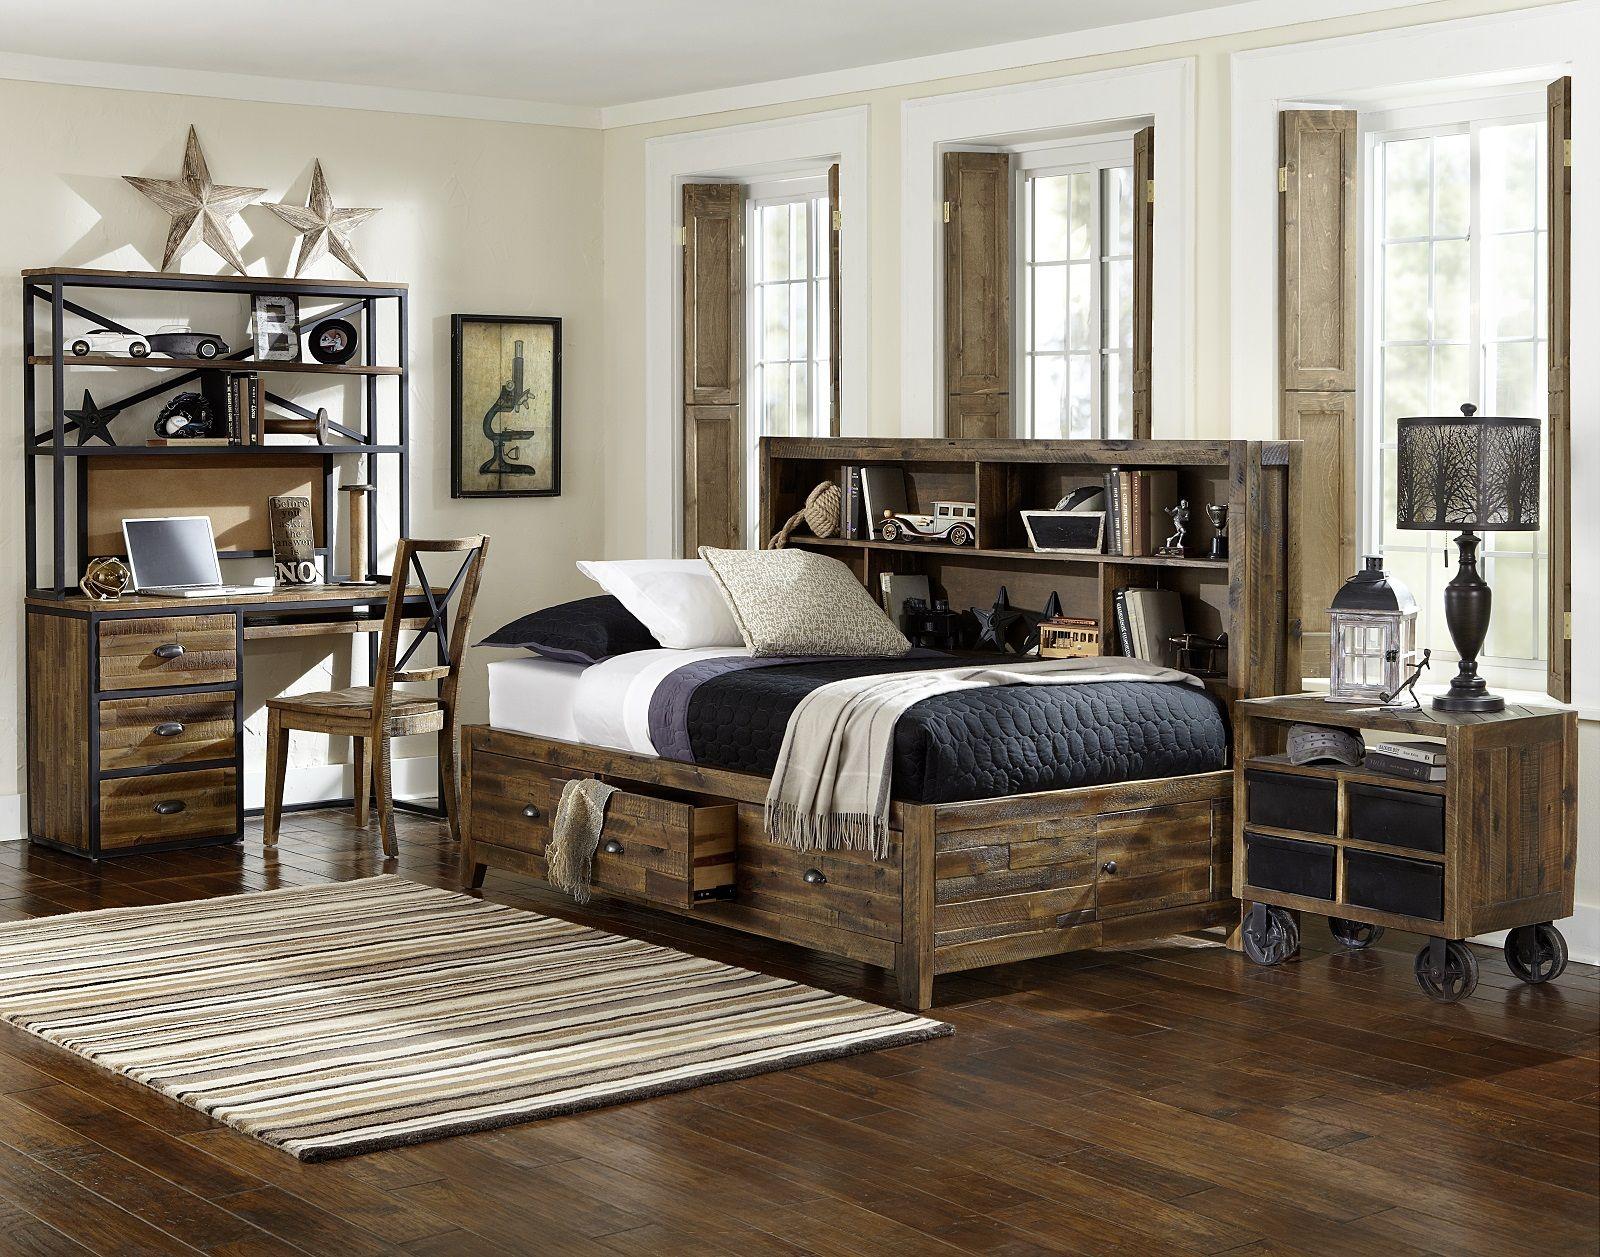 Magnussen Furniture Braxton Lounge Bedroom Set with Storage Rails ...